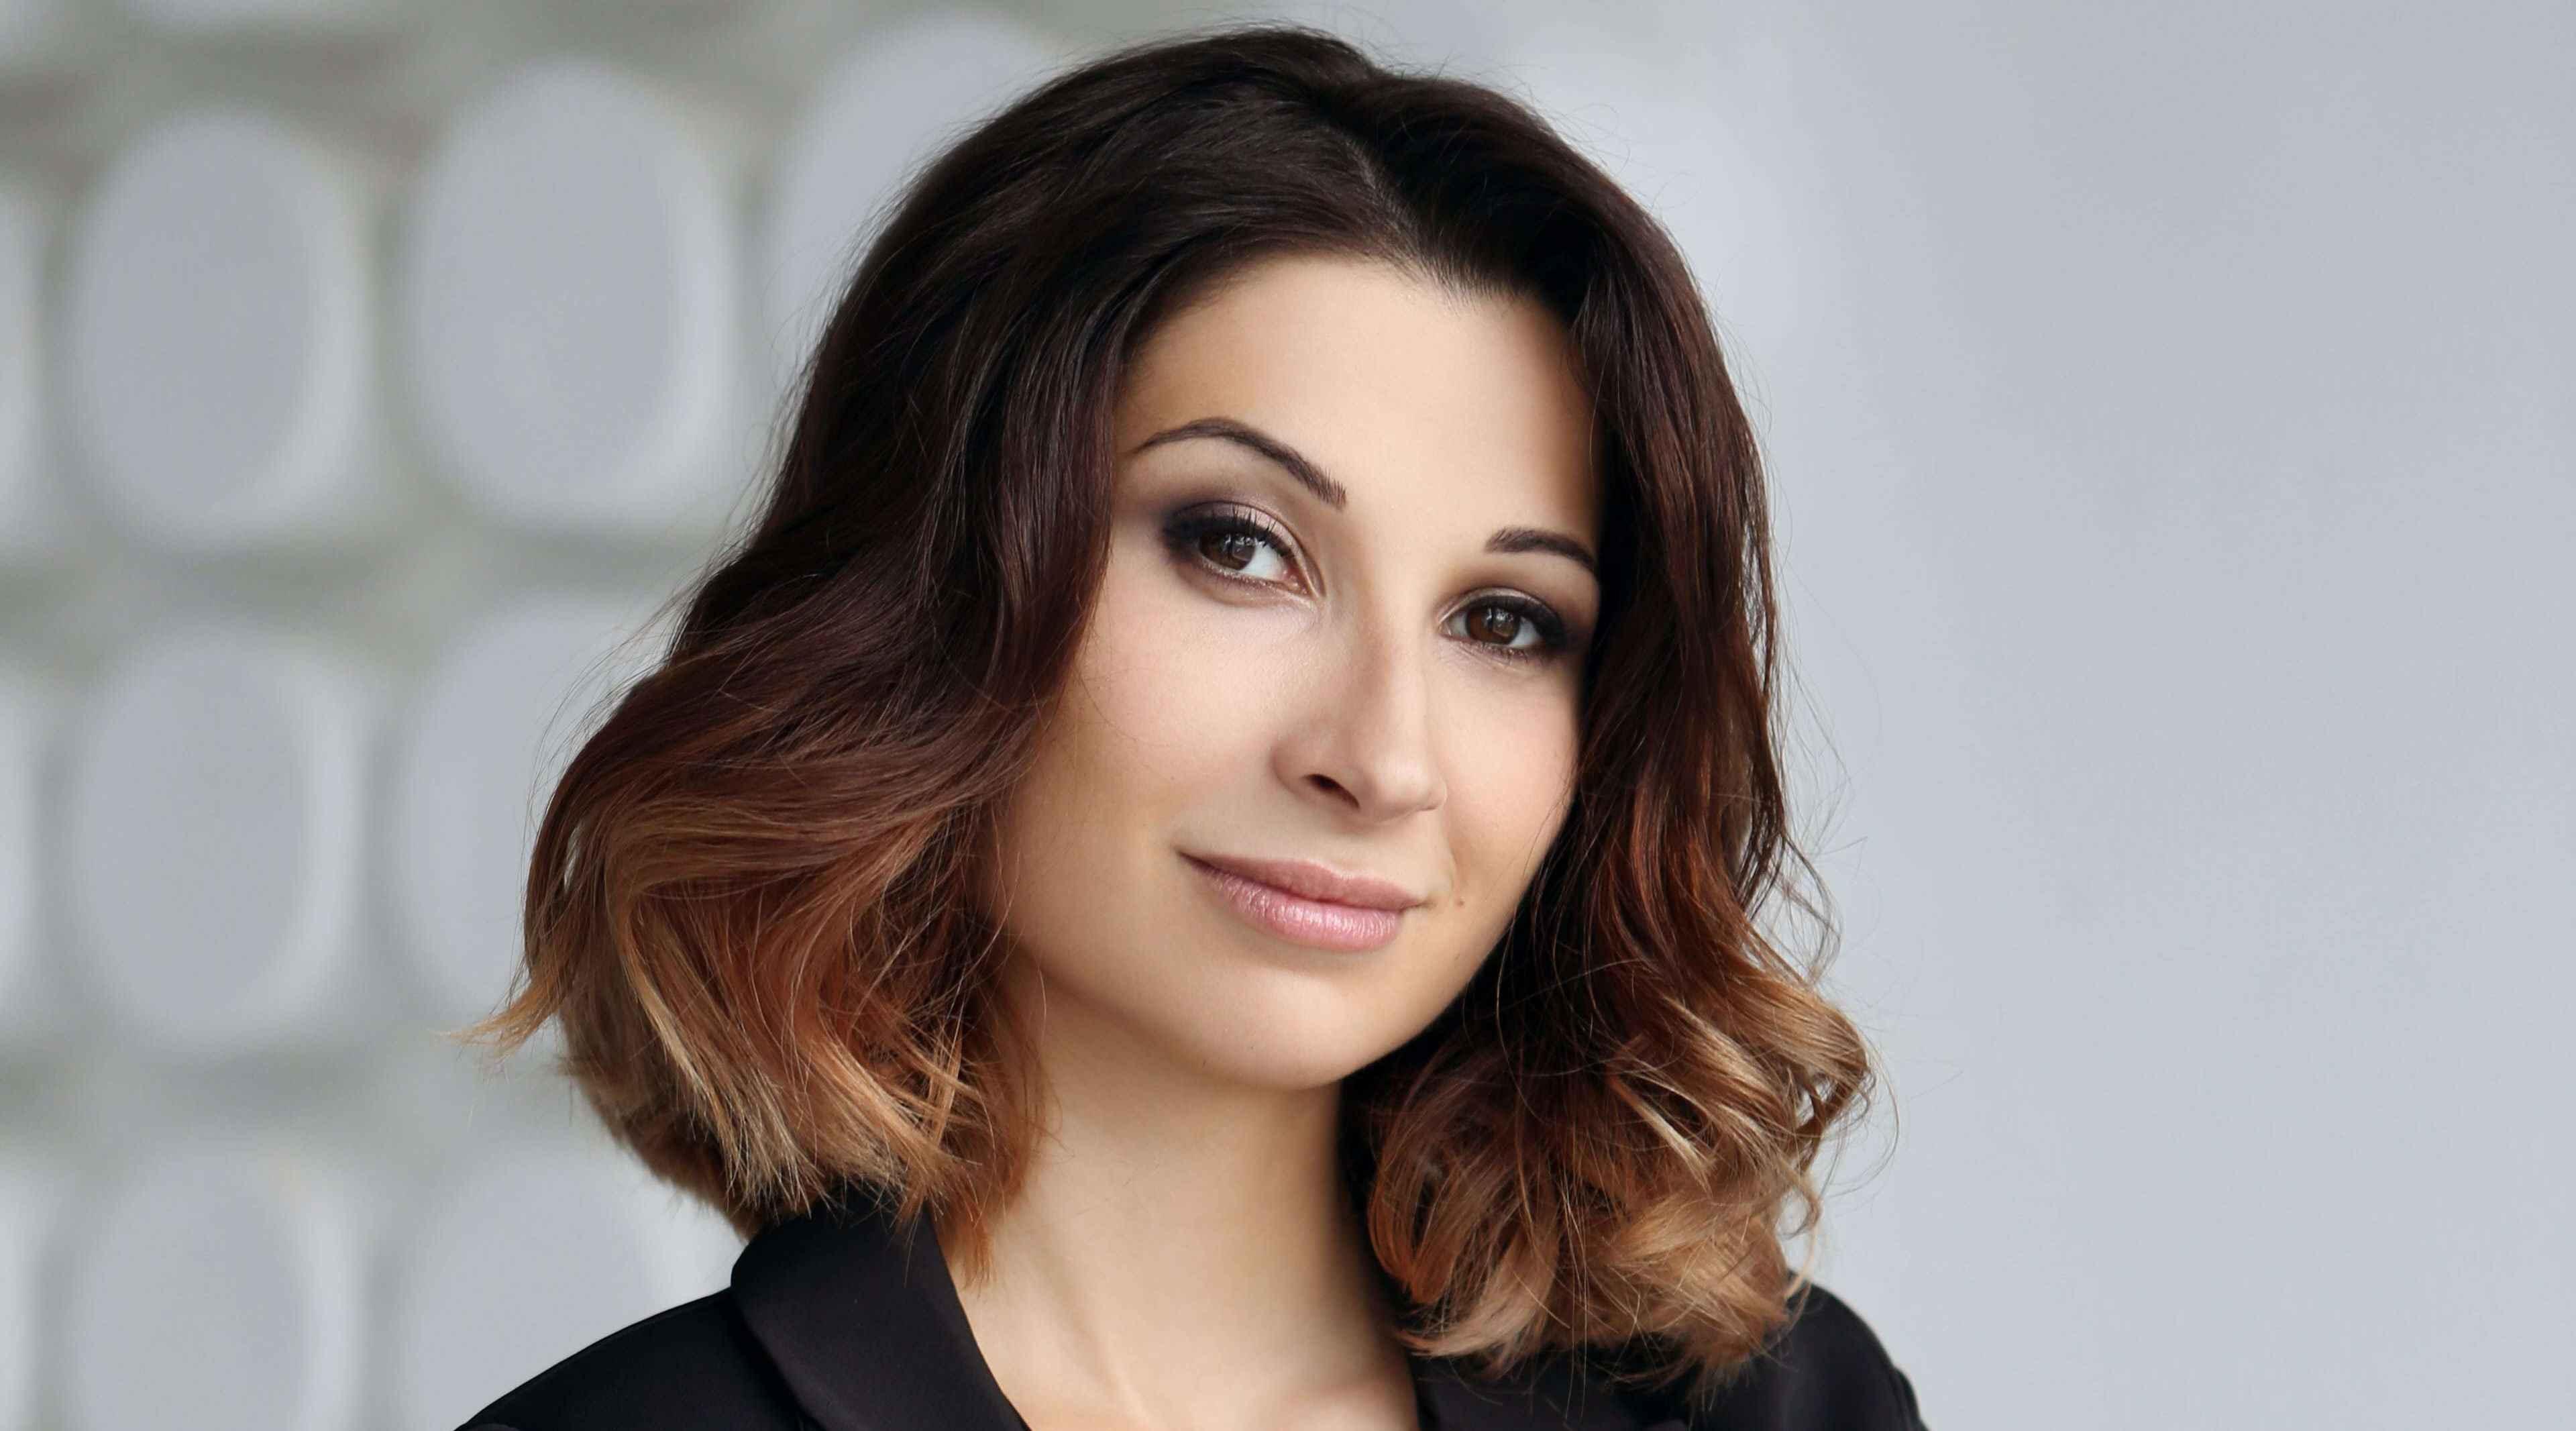 Evgenia Asanova competes for BBC Cardiff Singer of the World 2021 Award